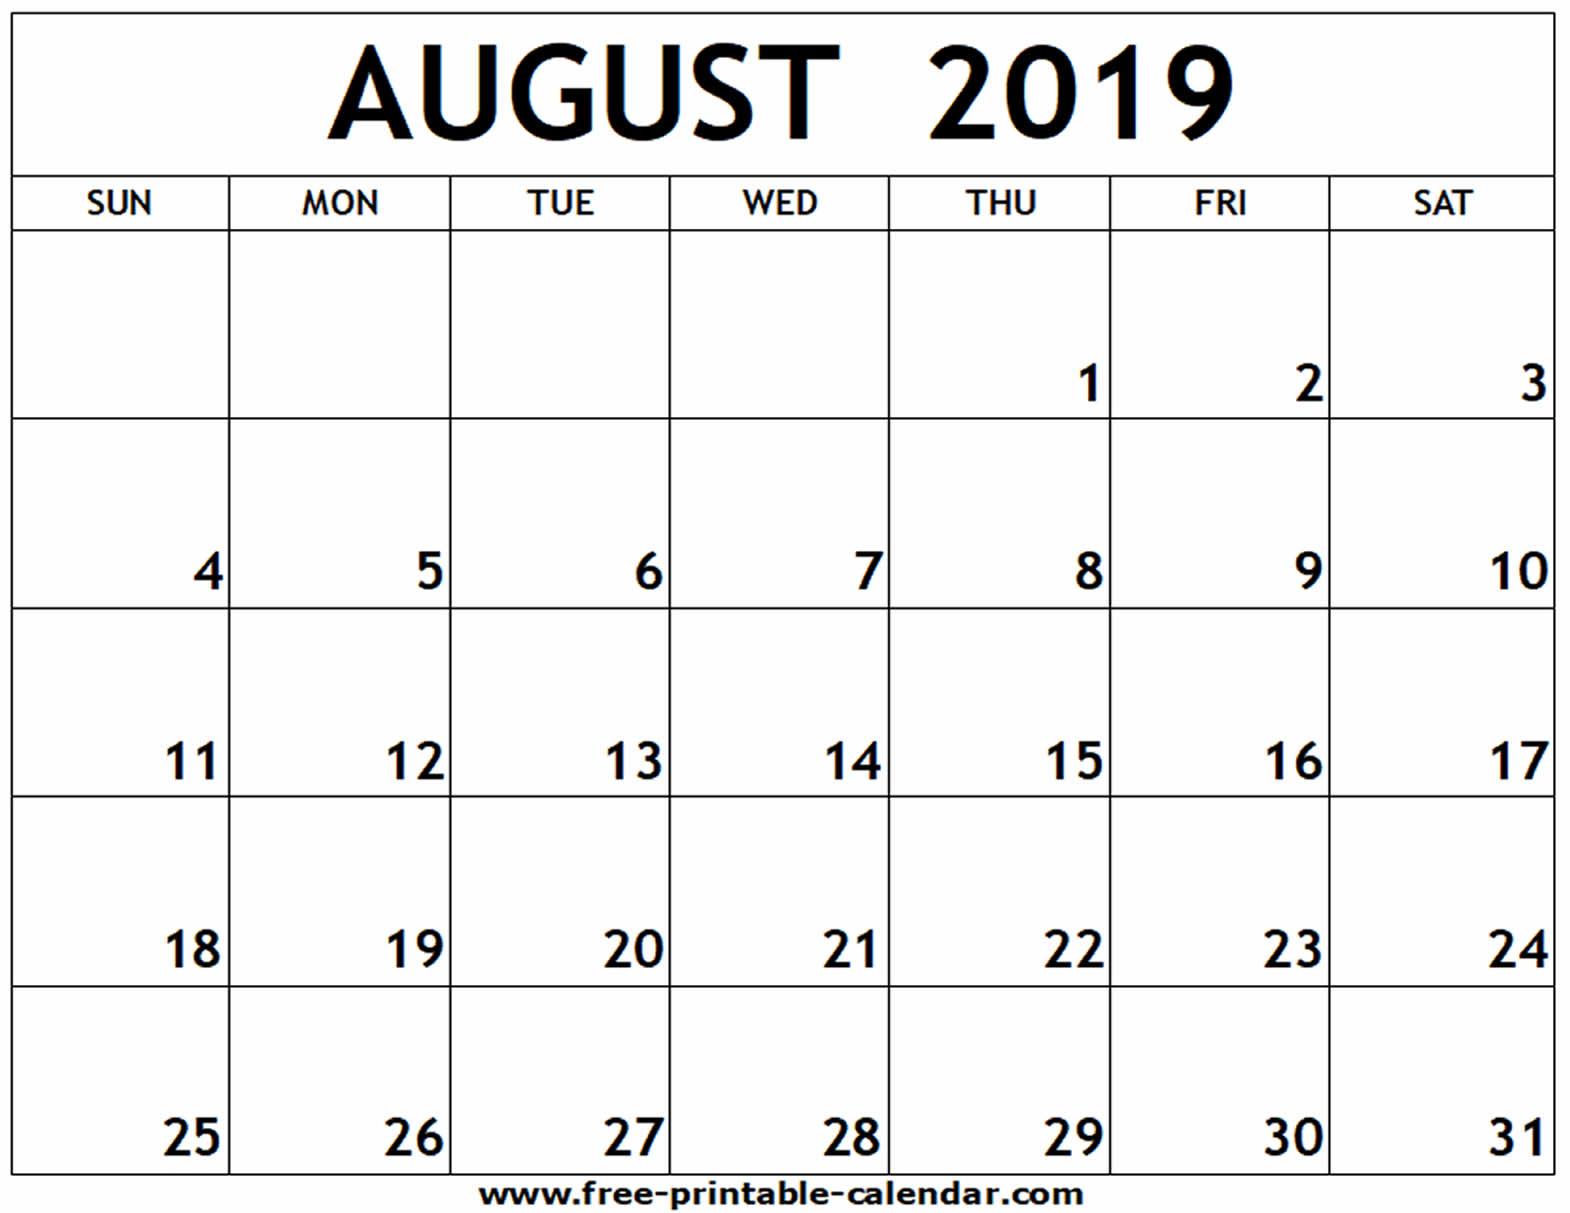 August 2019 Printable Calendar - Free-Printable-Calendar inside Blank Calendar August Template Australia